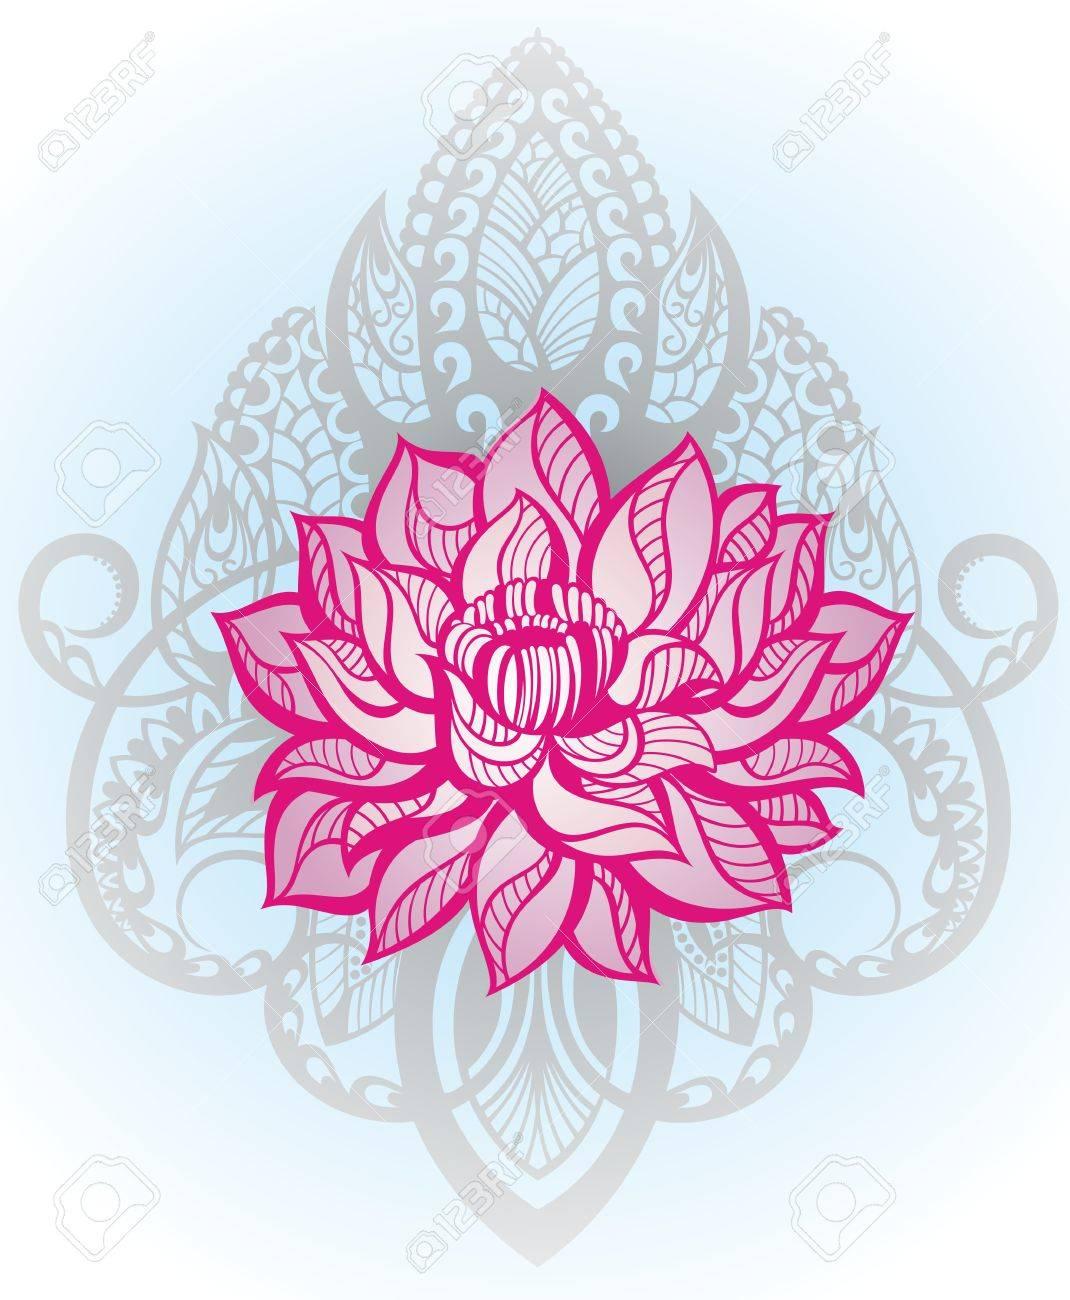 Oriental style flower lotus tattoo design element royalty free flower lotus tattoo design element stock vector 74952936 izmirmasajfo Gallery